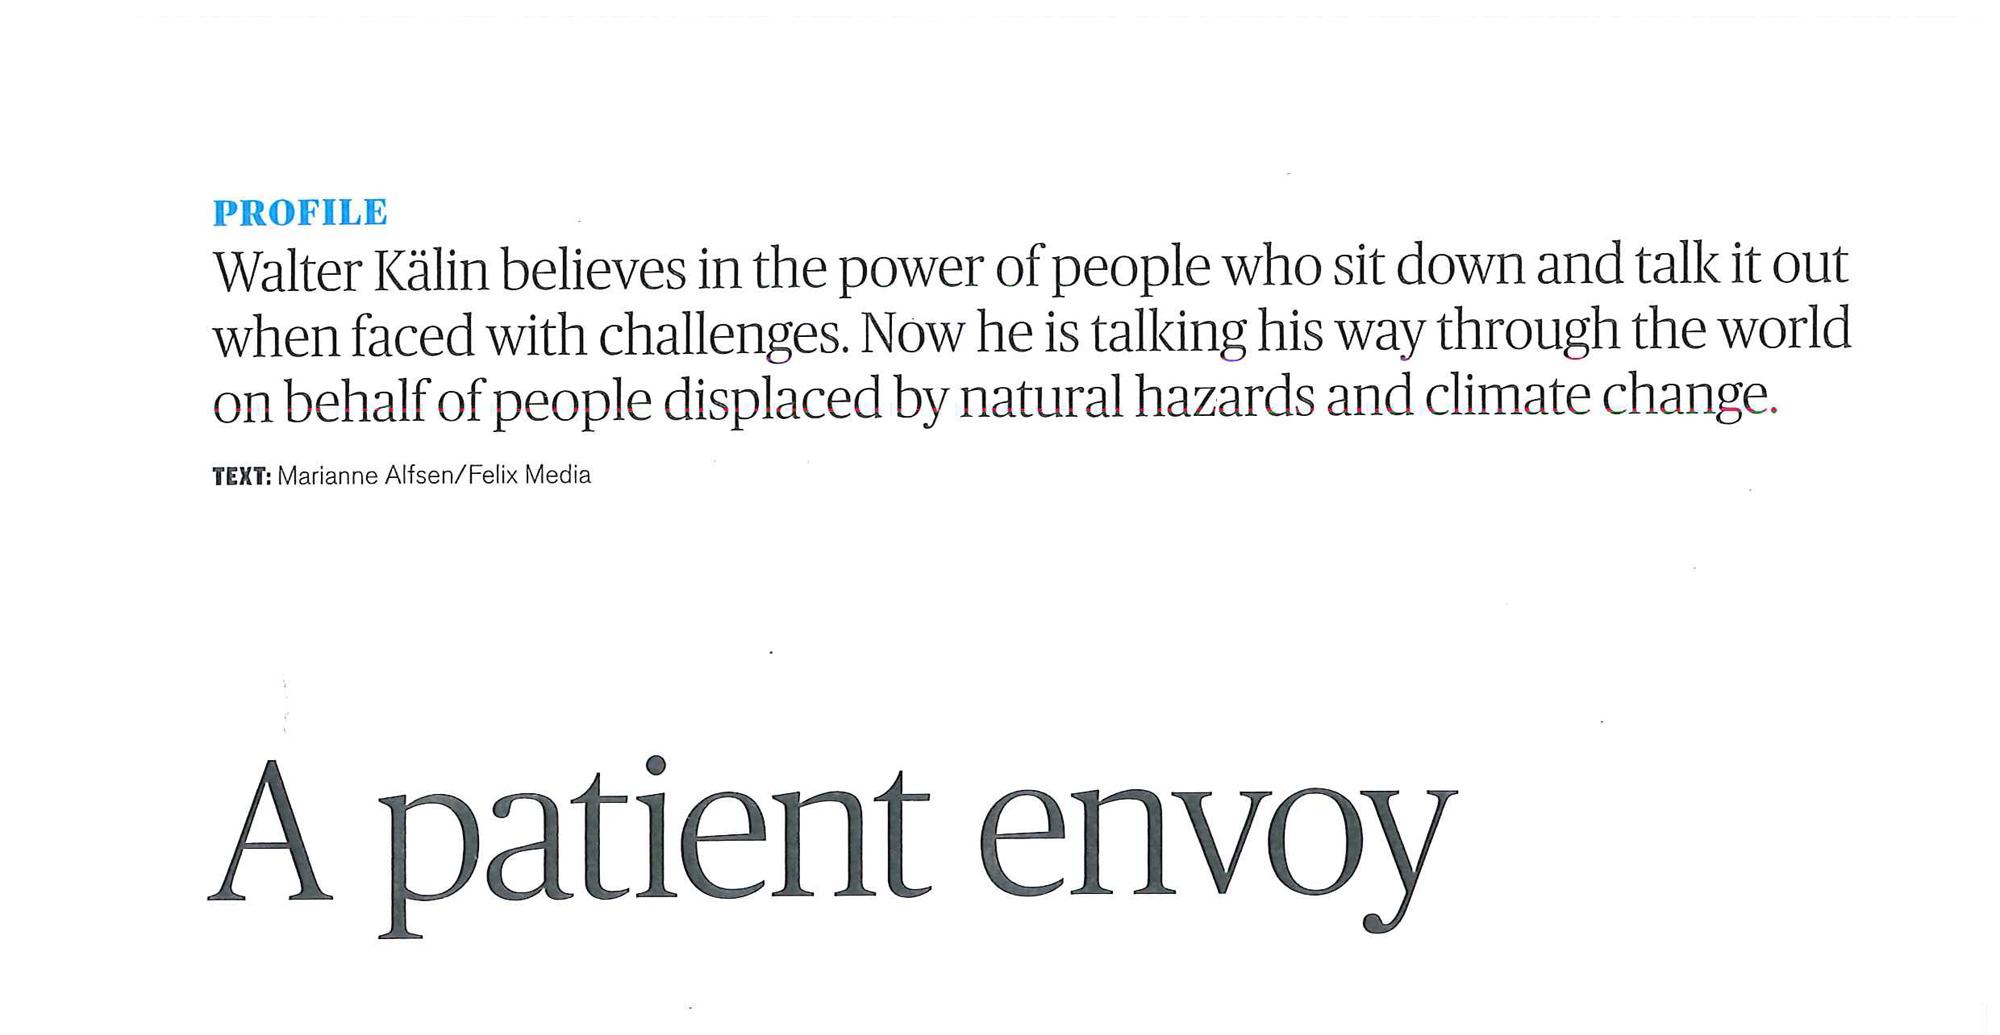 A Patient Envoy